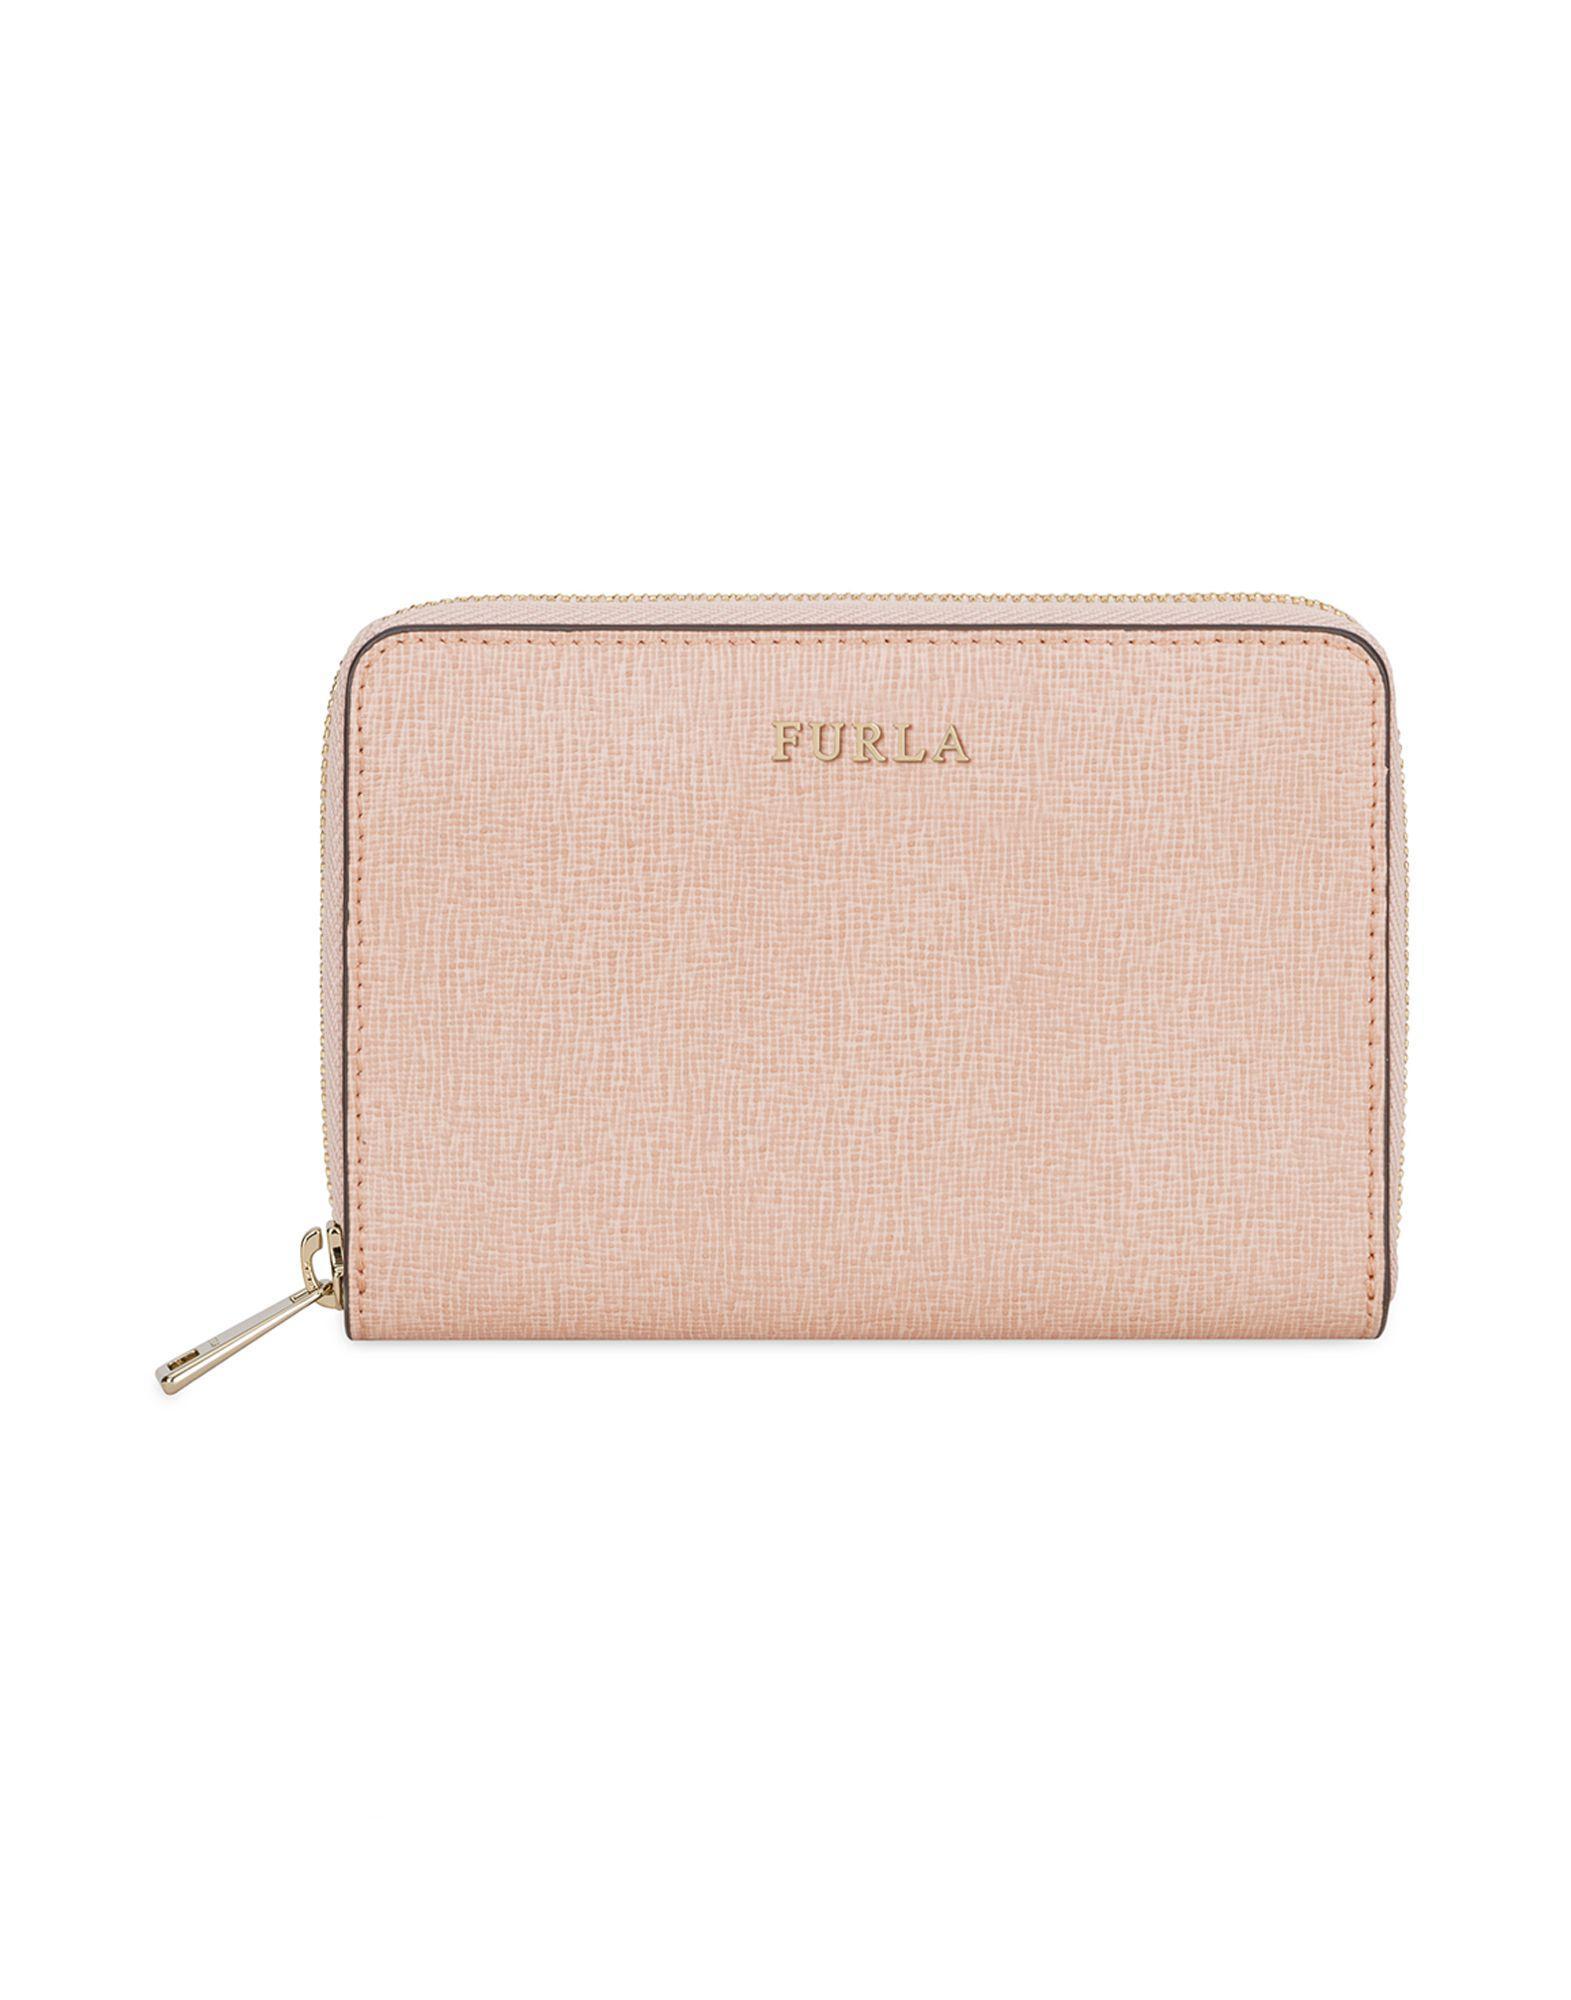 Furla Wallet In Pale Pink